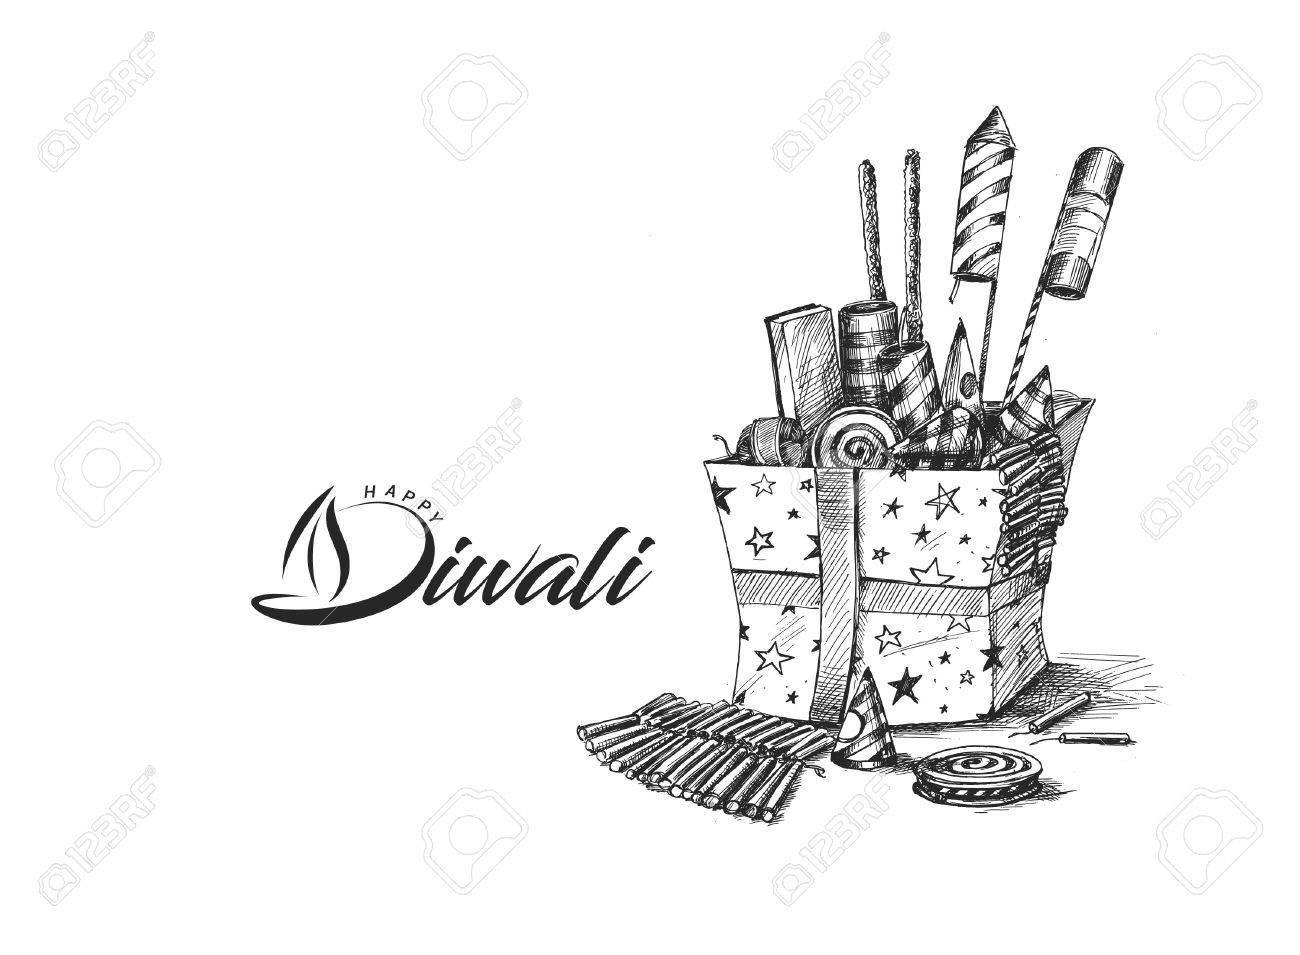 Diwali crackers for diwali gift hand drawn sketch vector